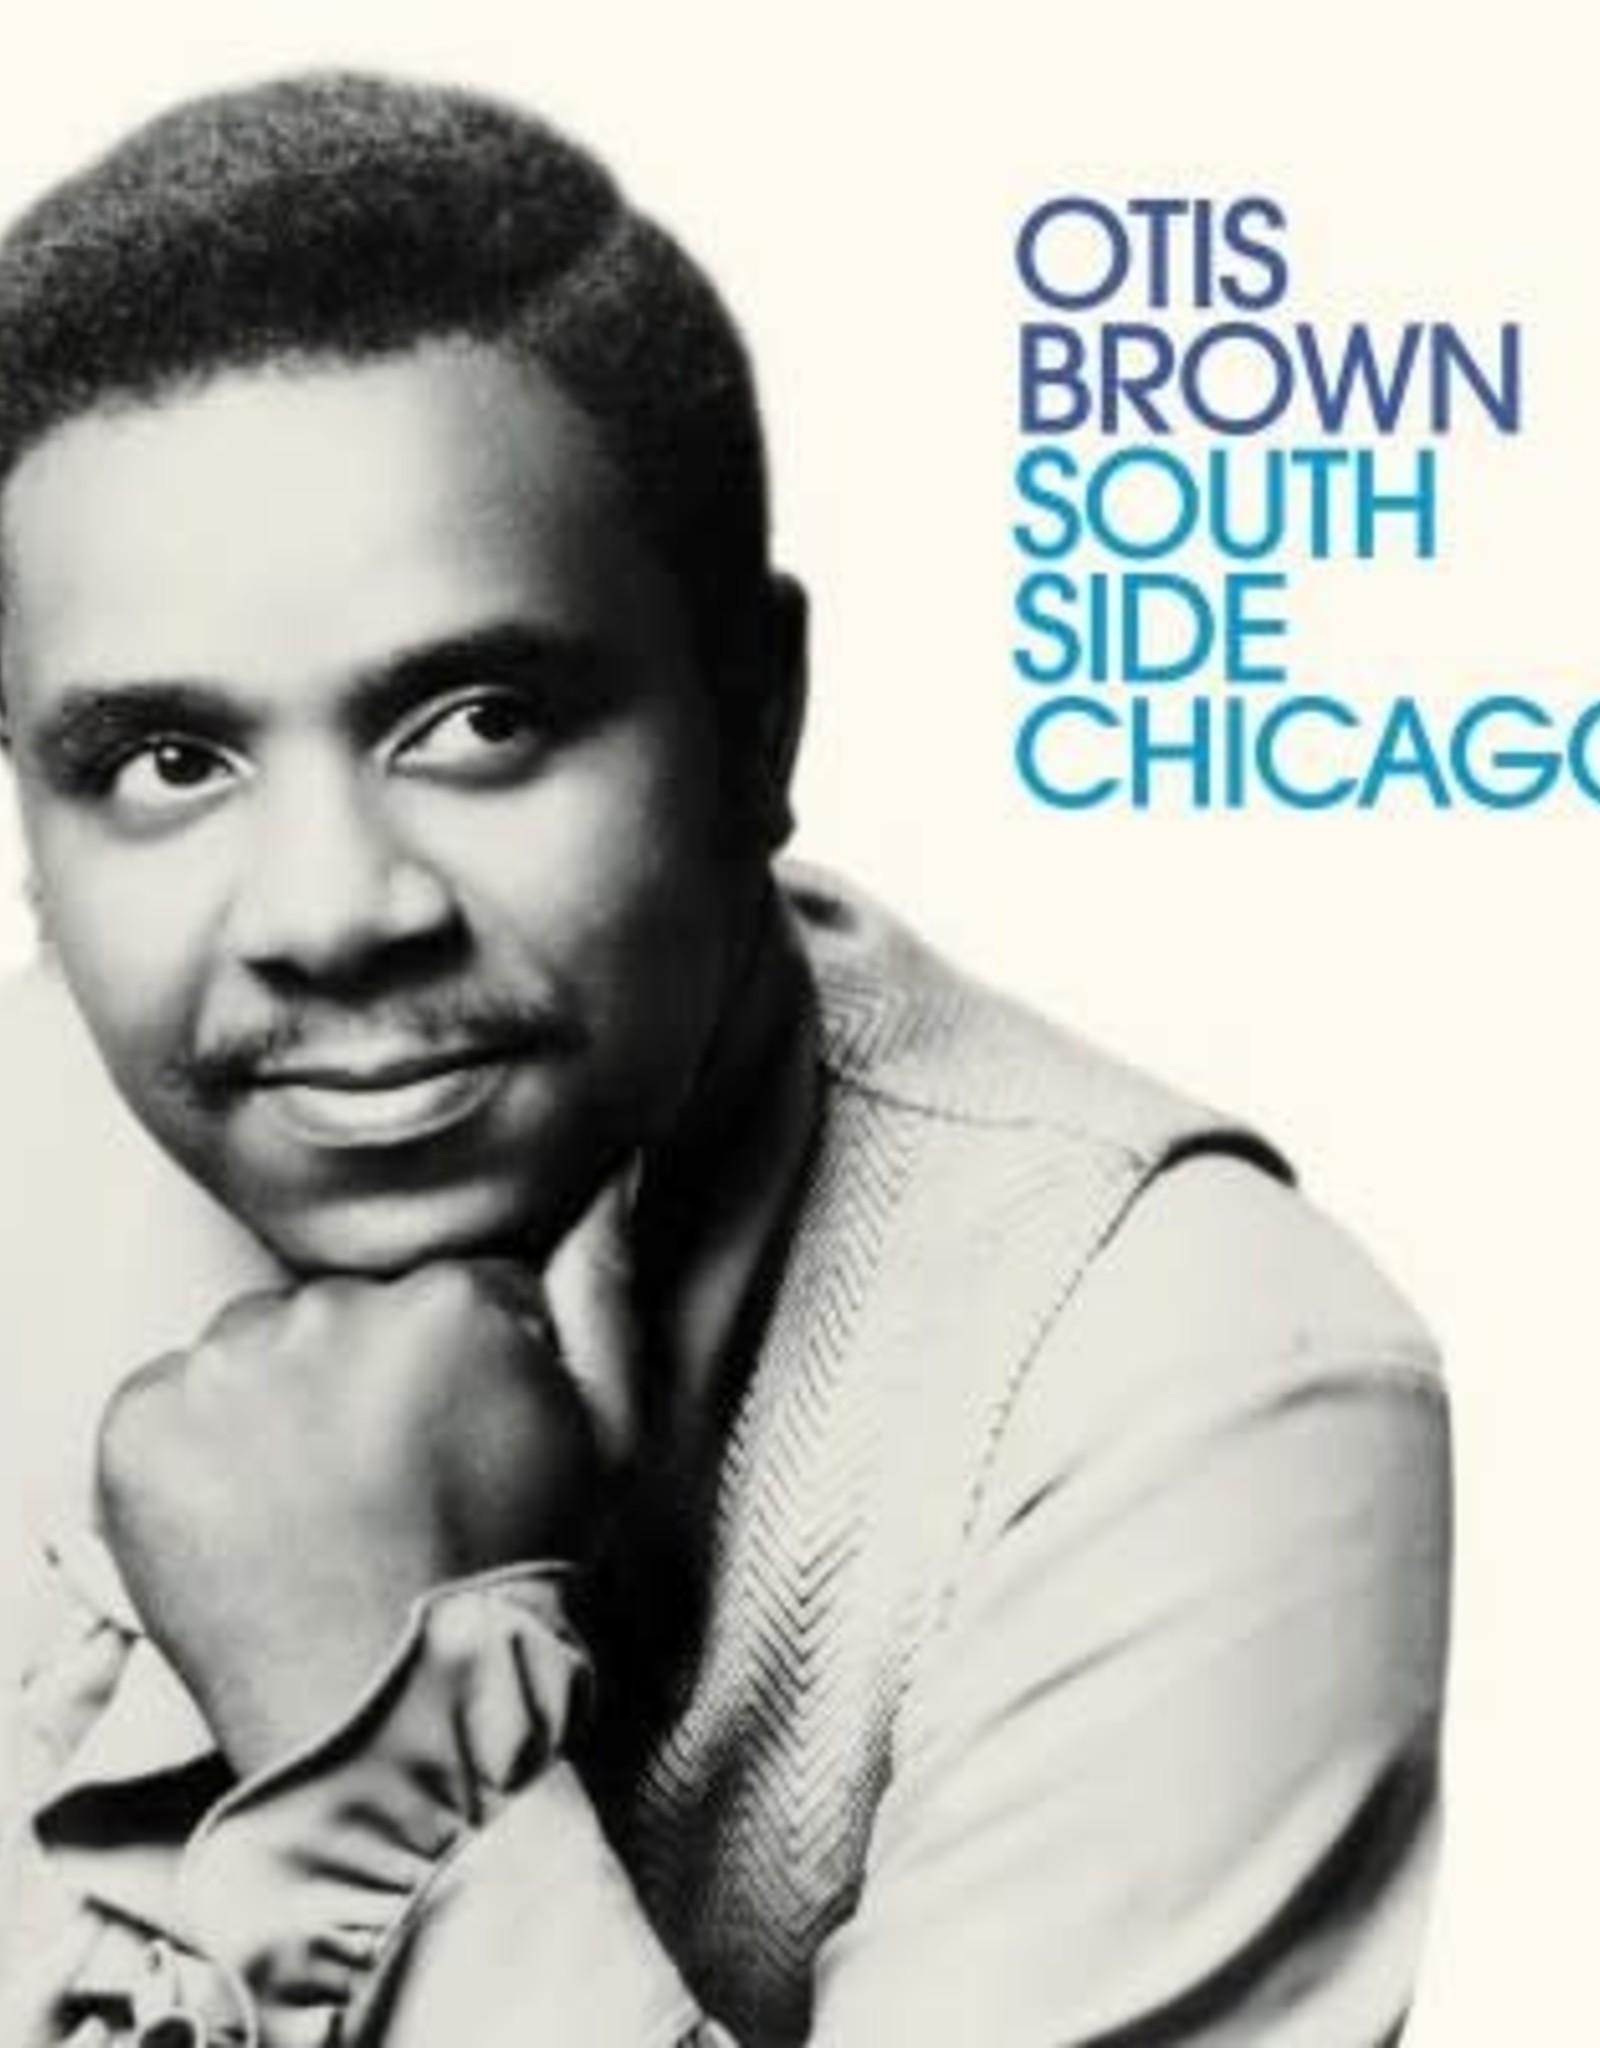 Otis Brown - Southside Chicago